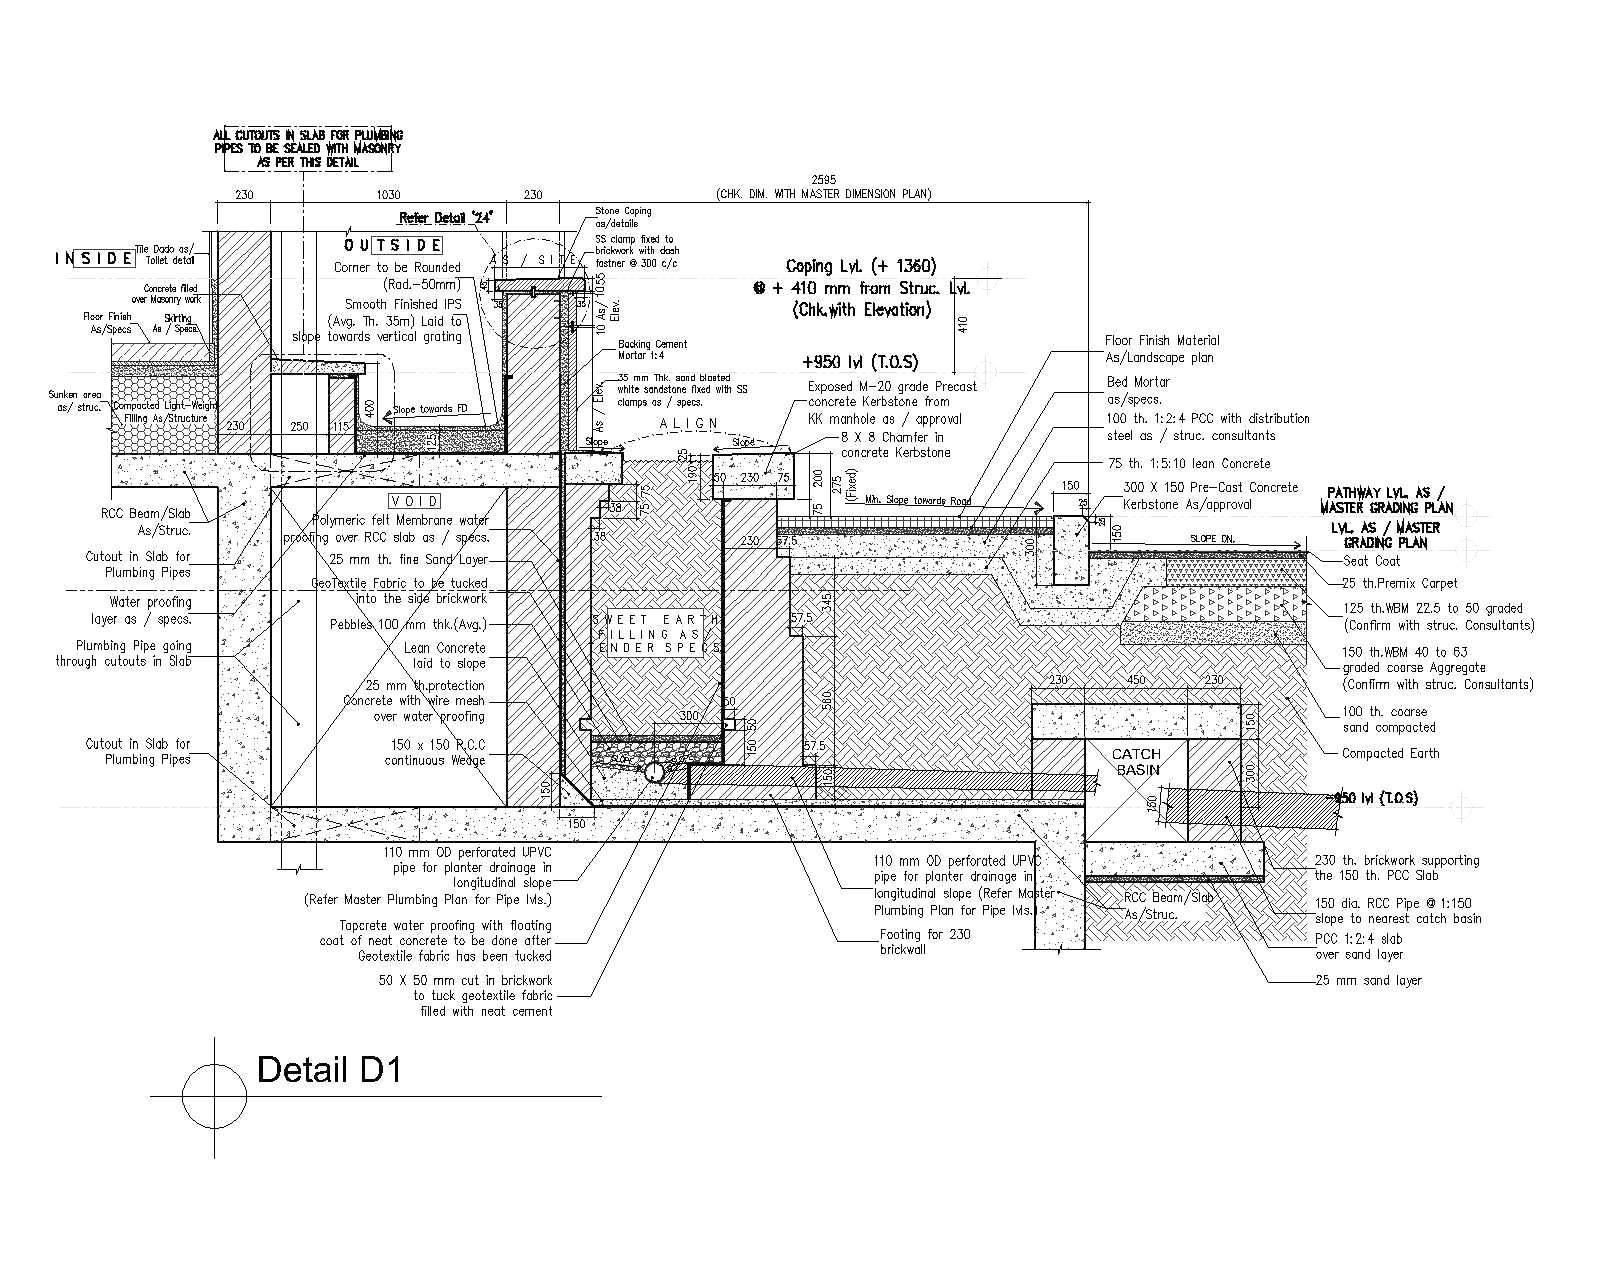 chinese atv wiring diagram 50cc new 110 house wiring diagramschinese atv wiring diagram 50cc new 110